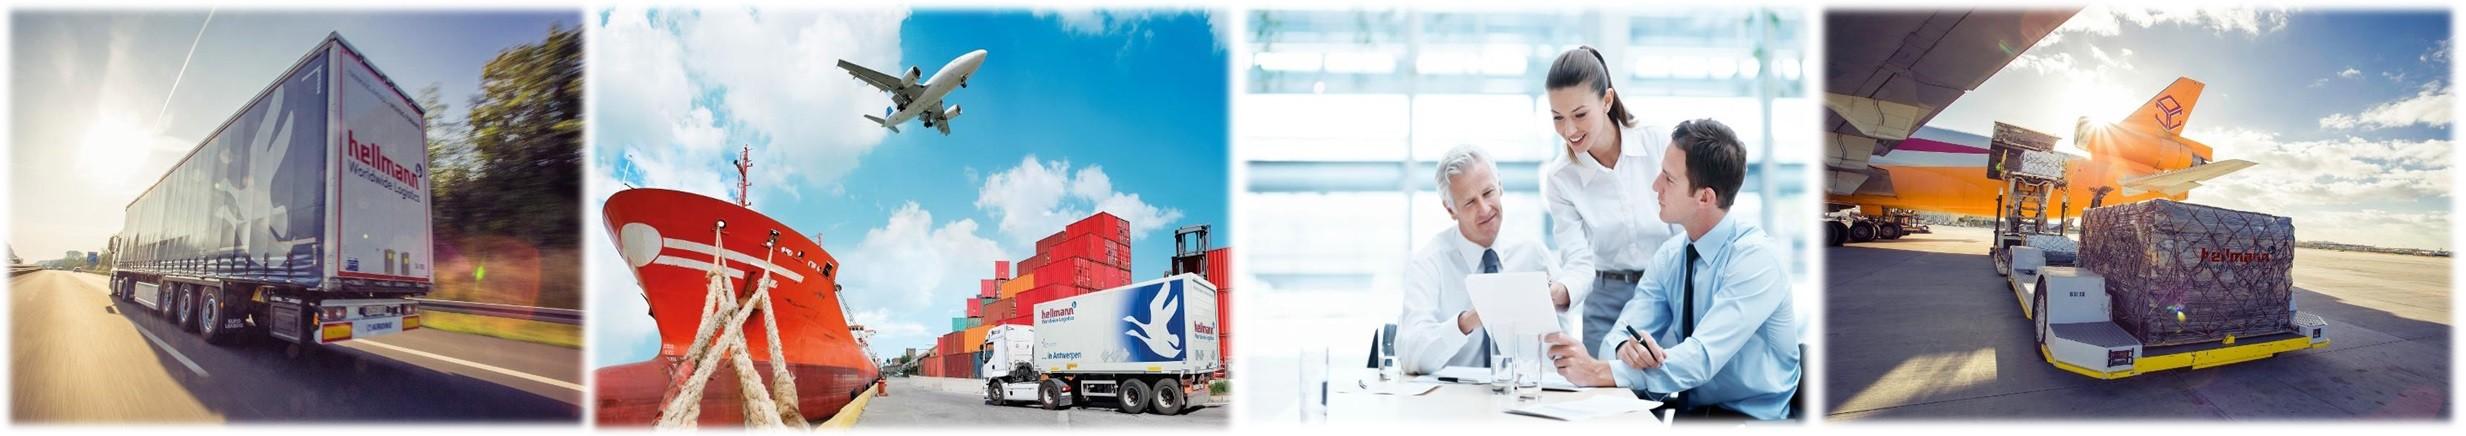 Hellmann Worldwide Logistics Thailand | LinkedIn